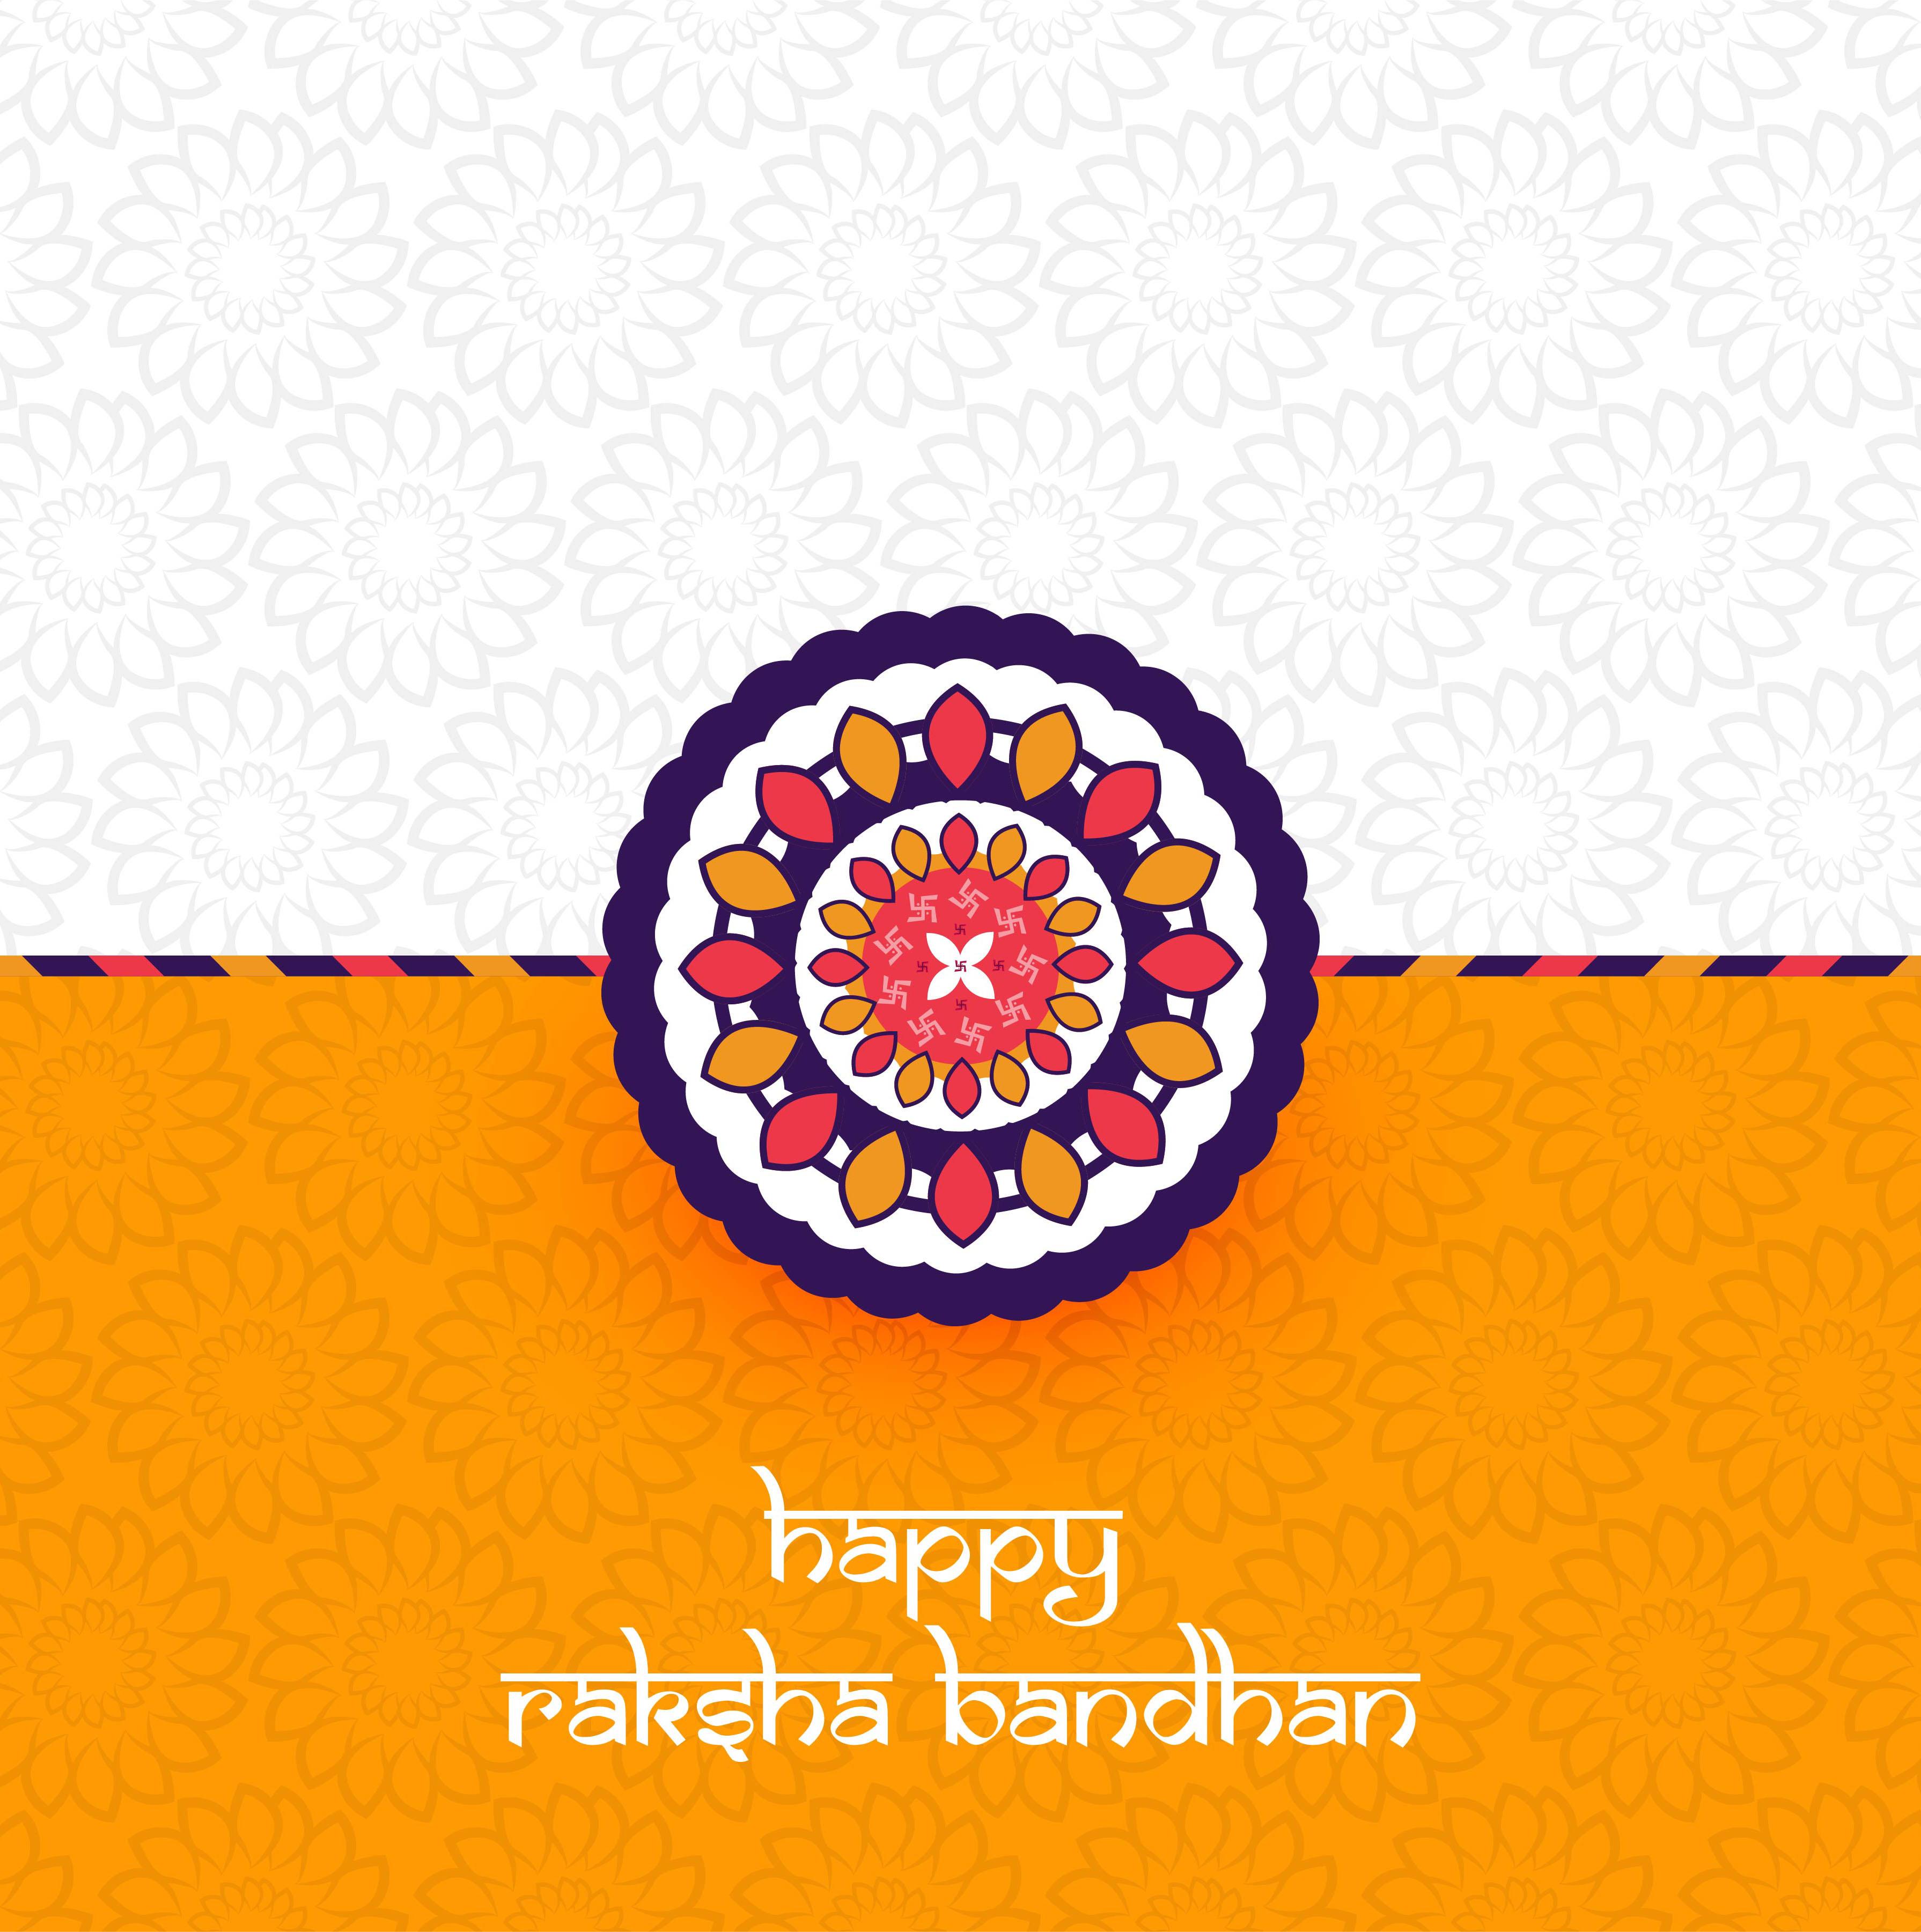 Beautiful Rakhi Decorated, Elegant Greeting Card Design